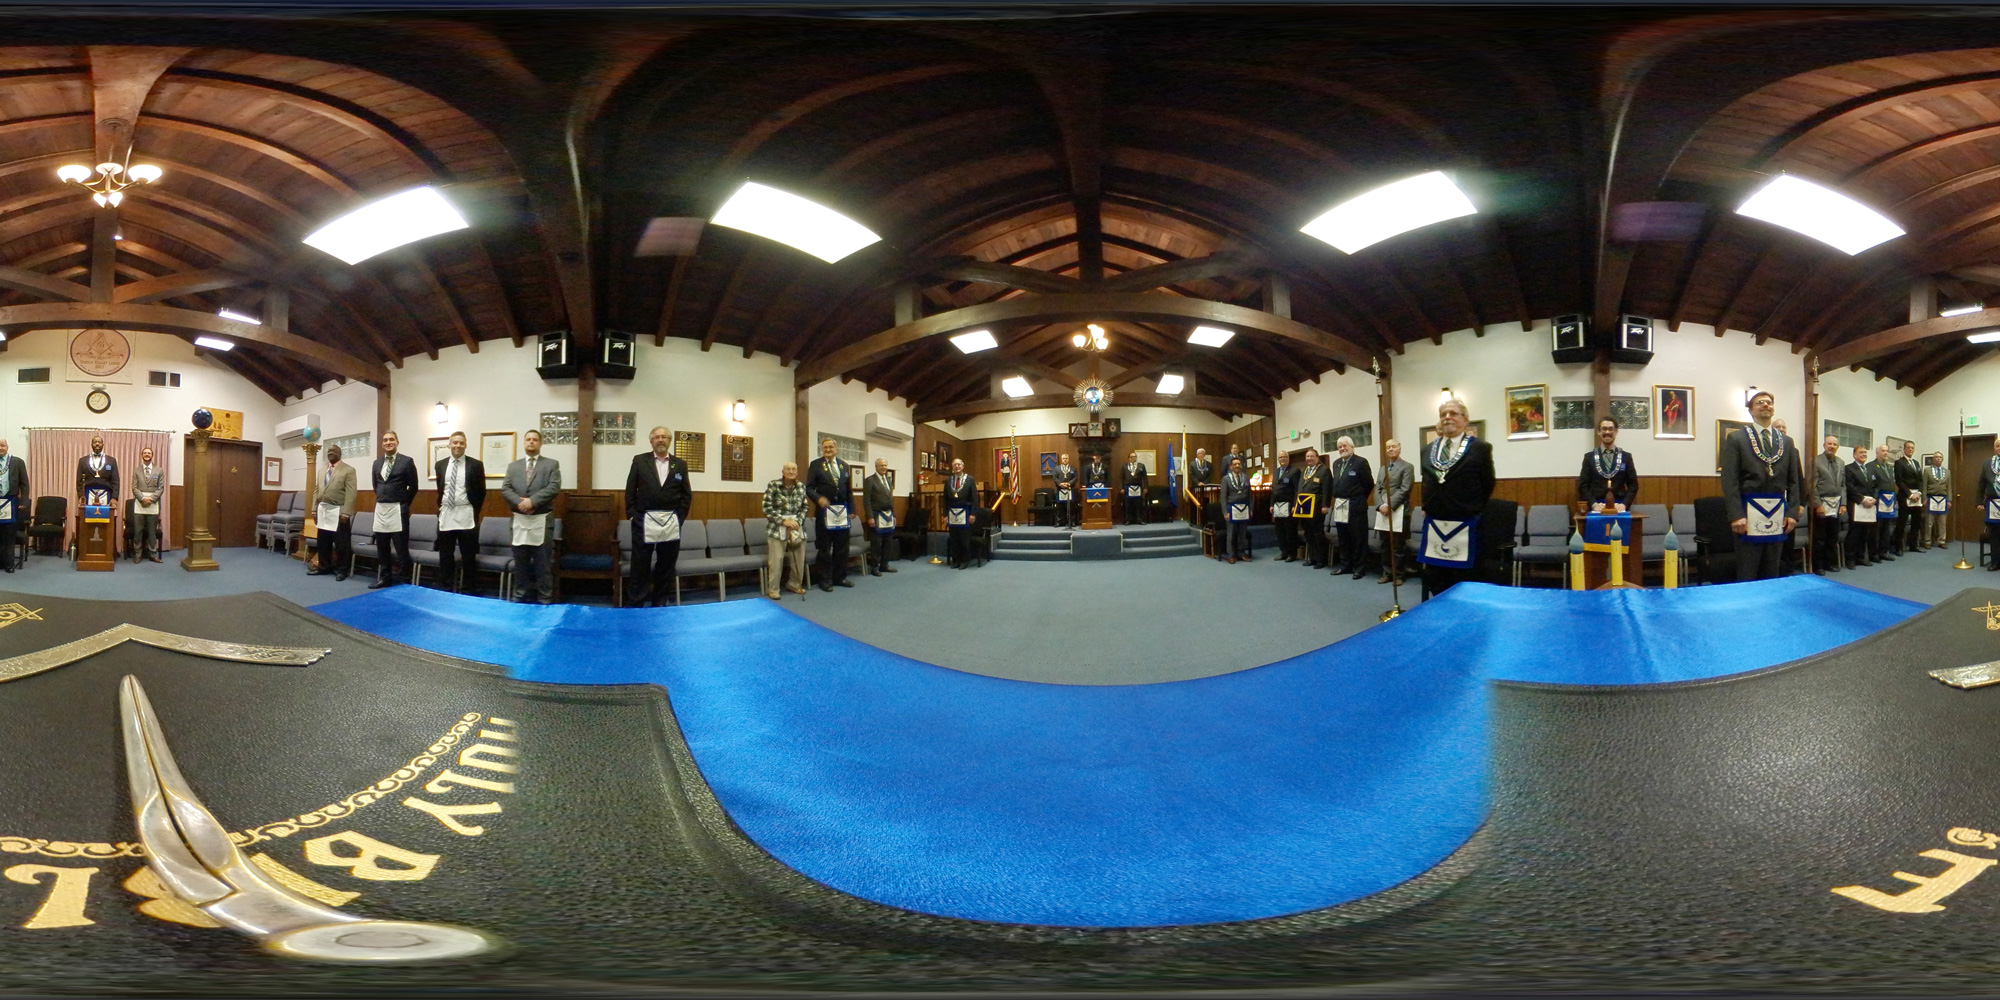 Conejo Valley Lodge Inside